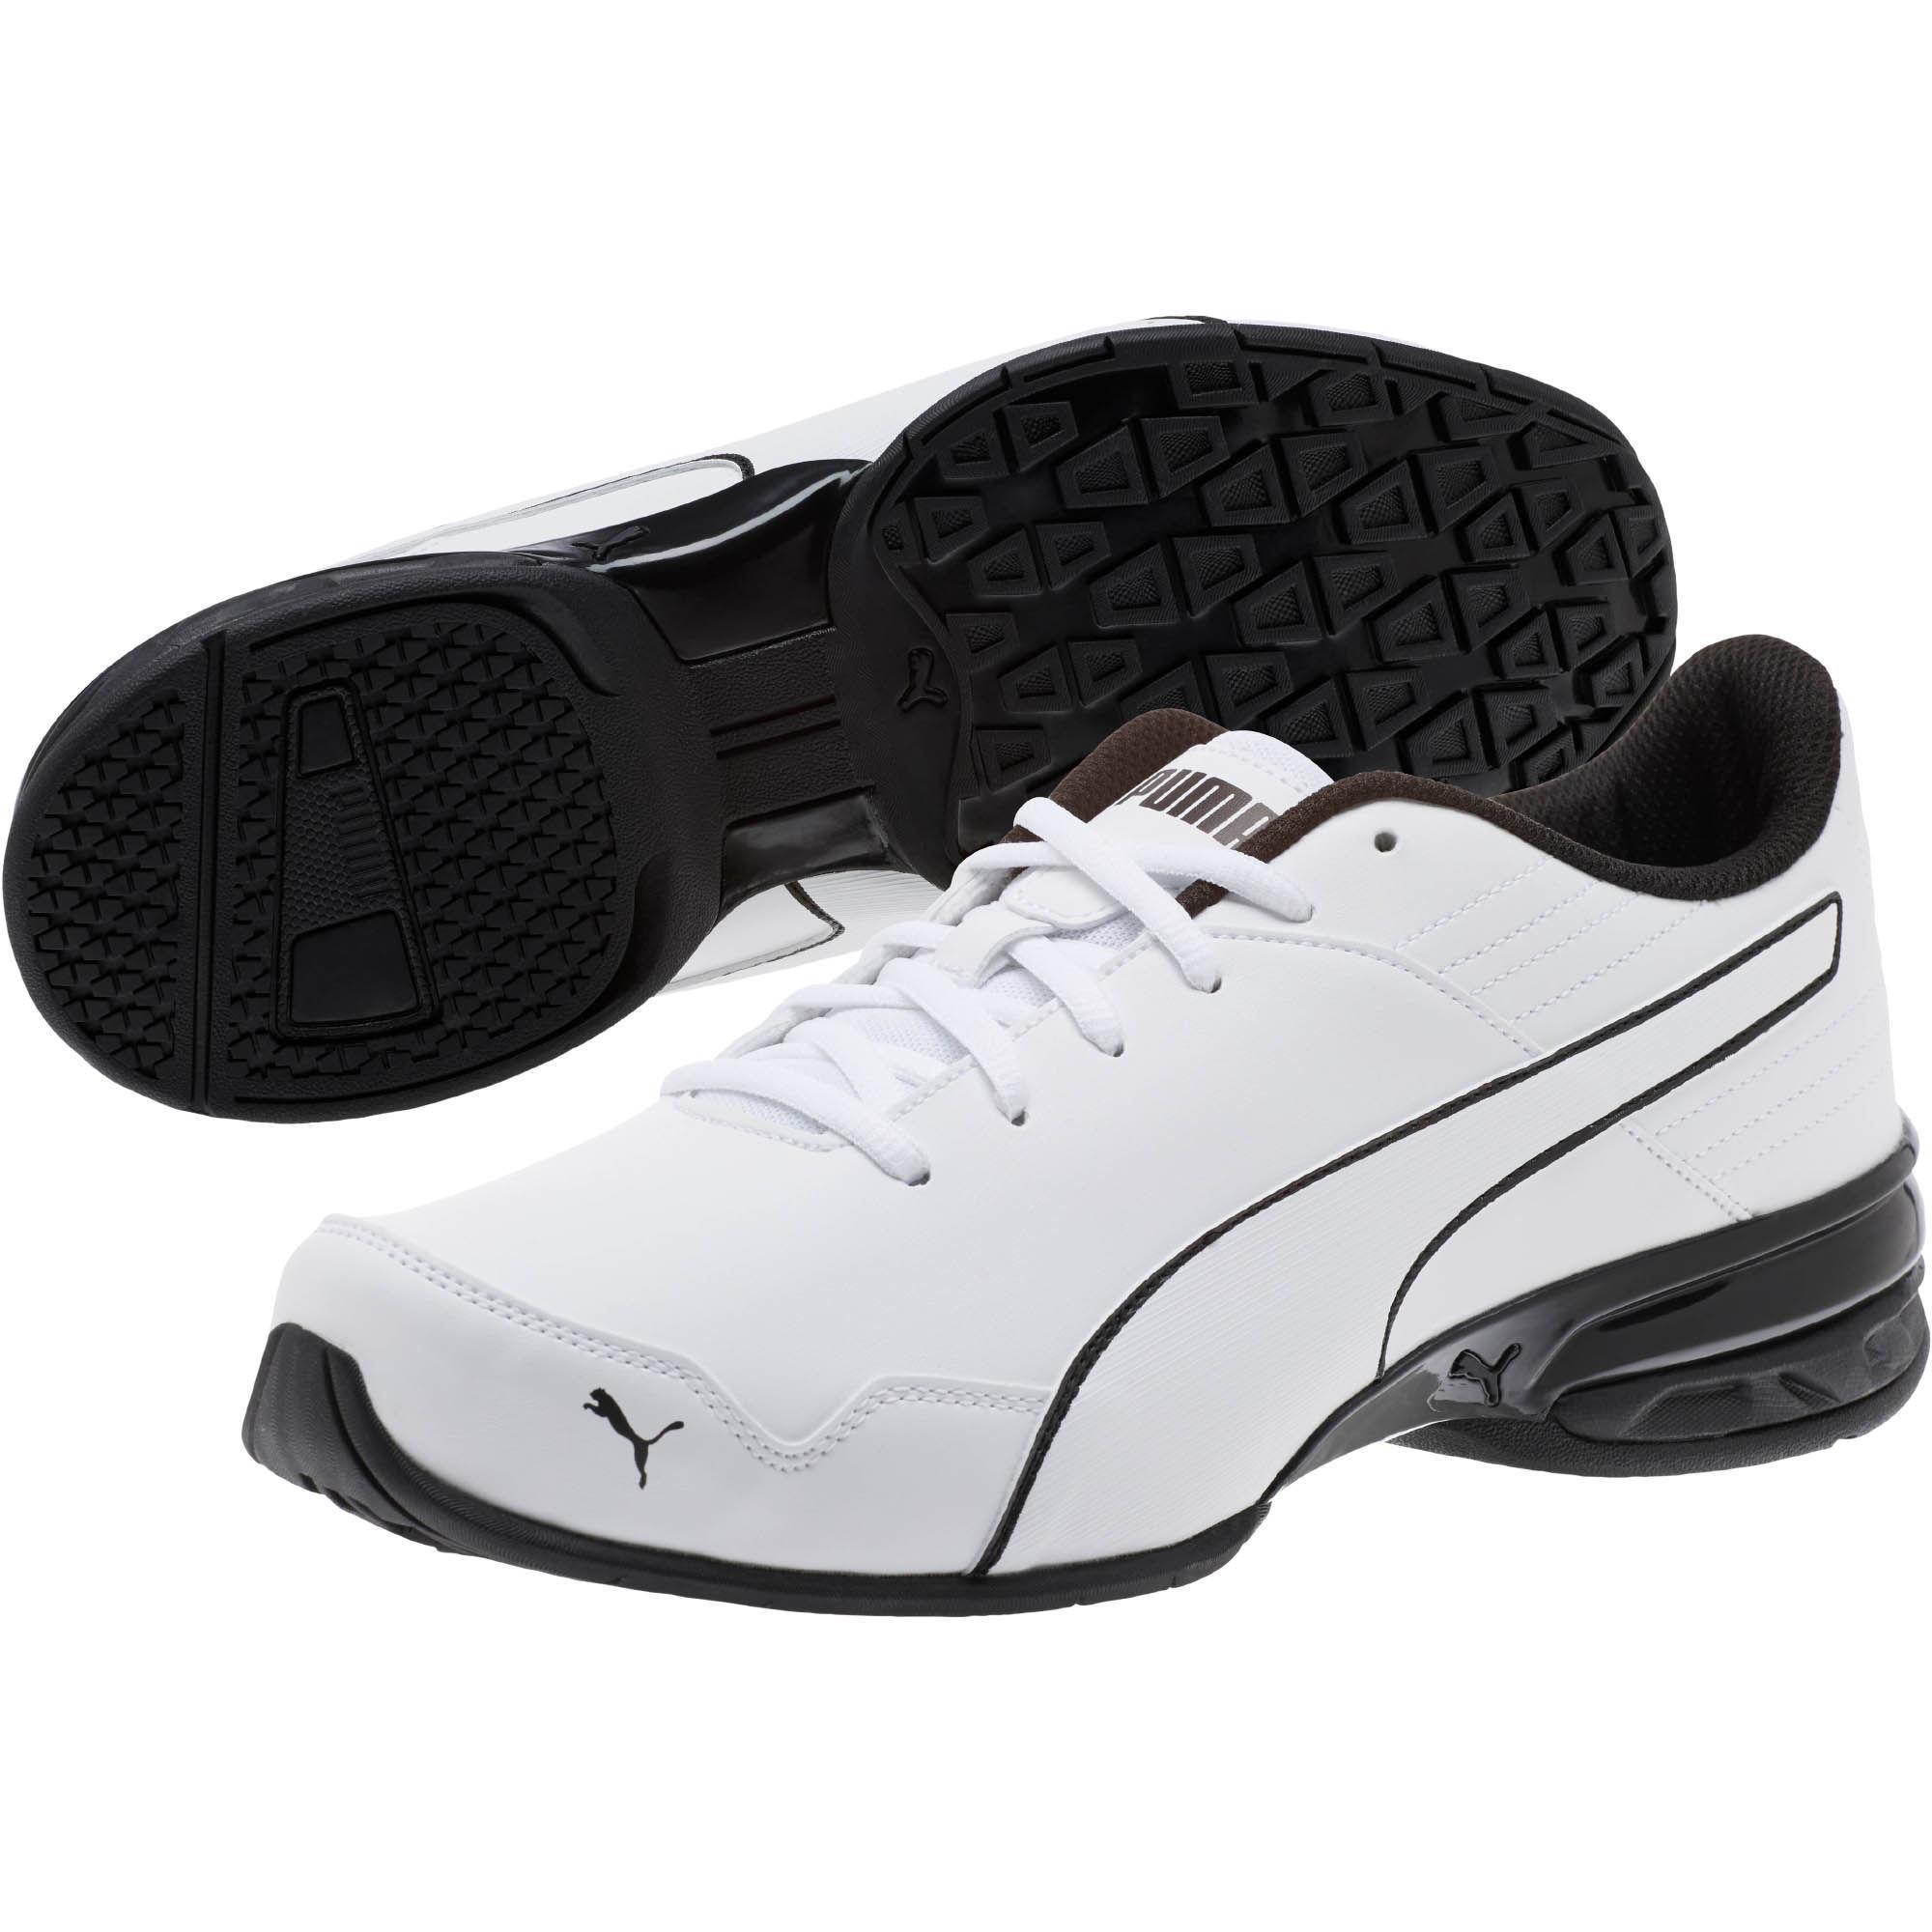 PUMA - White Super Levitate Men s Running Shoes for Men - Lyst. View  fullscreen 2eeb4603c